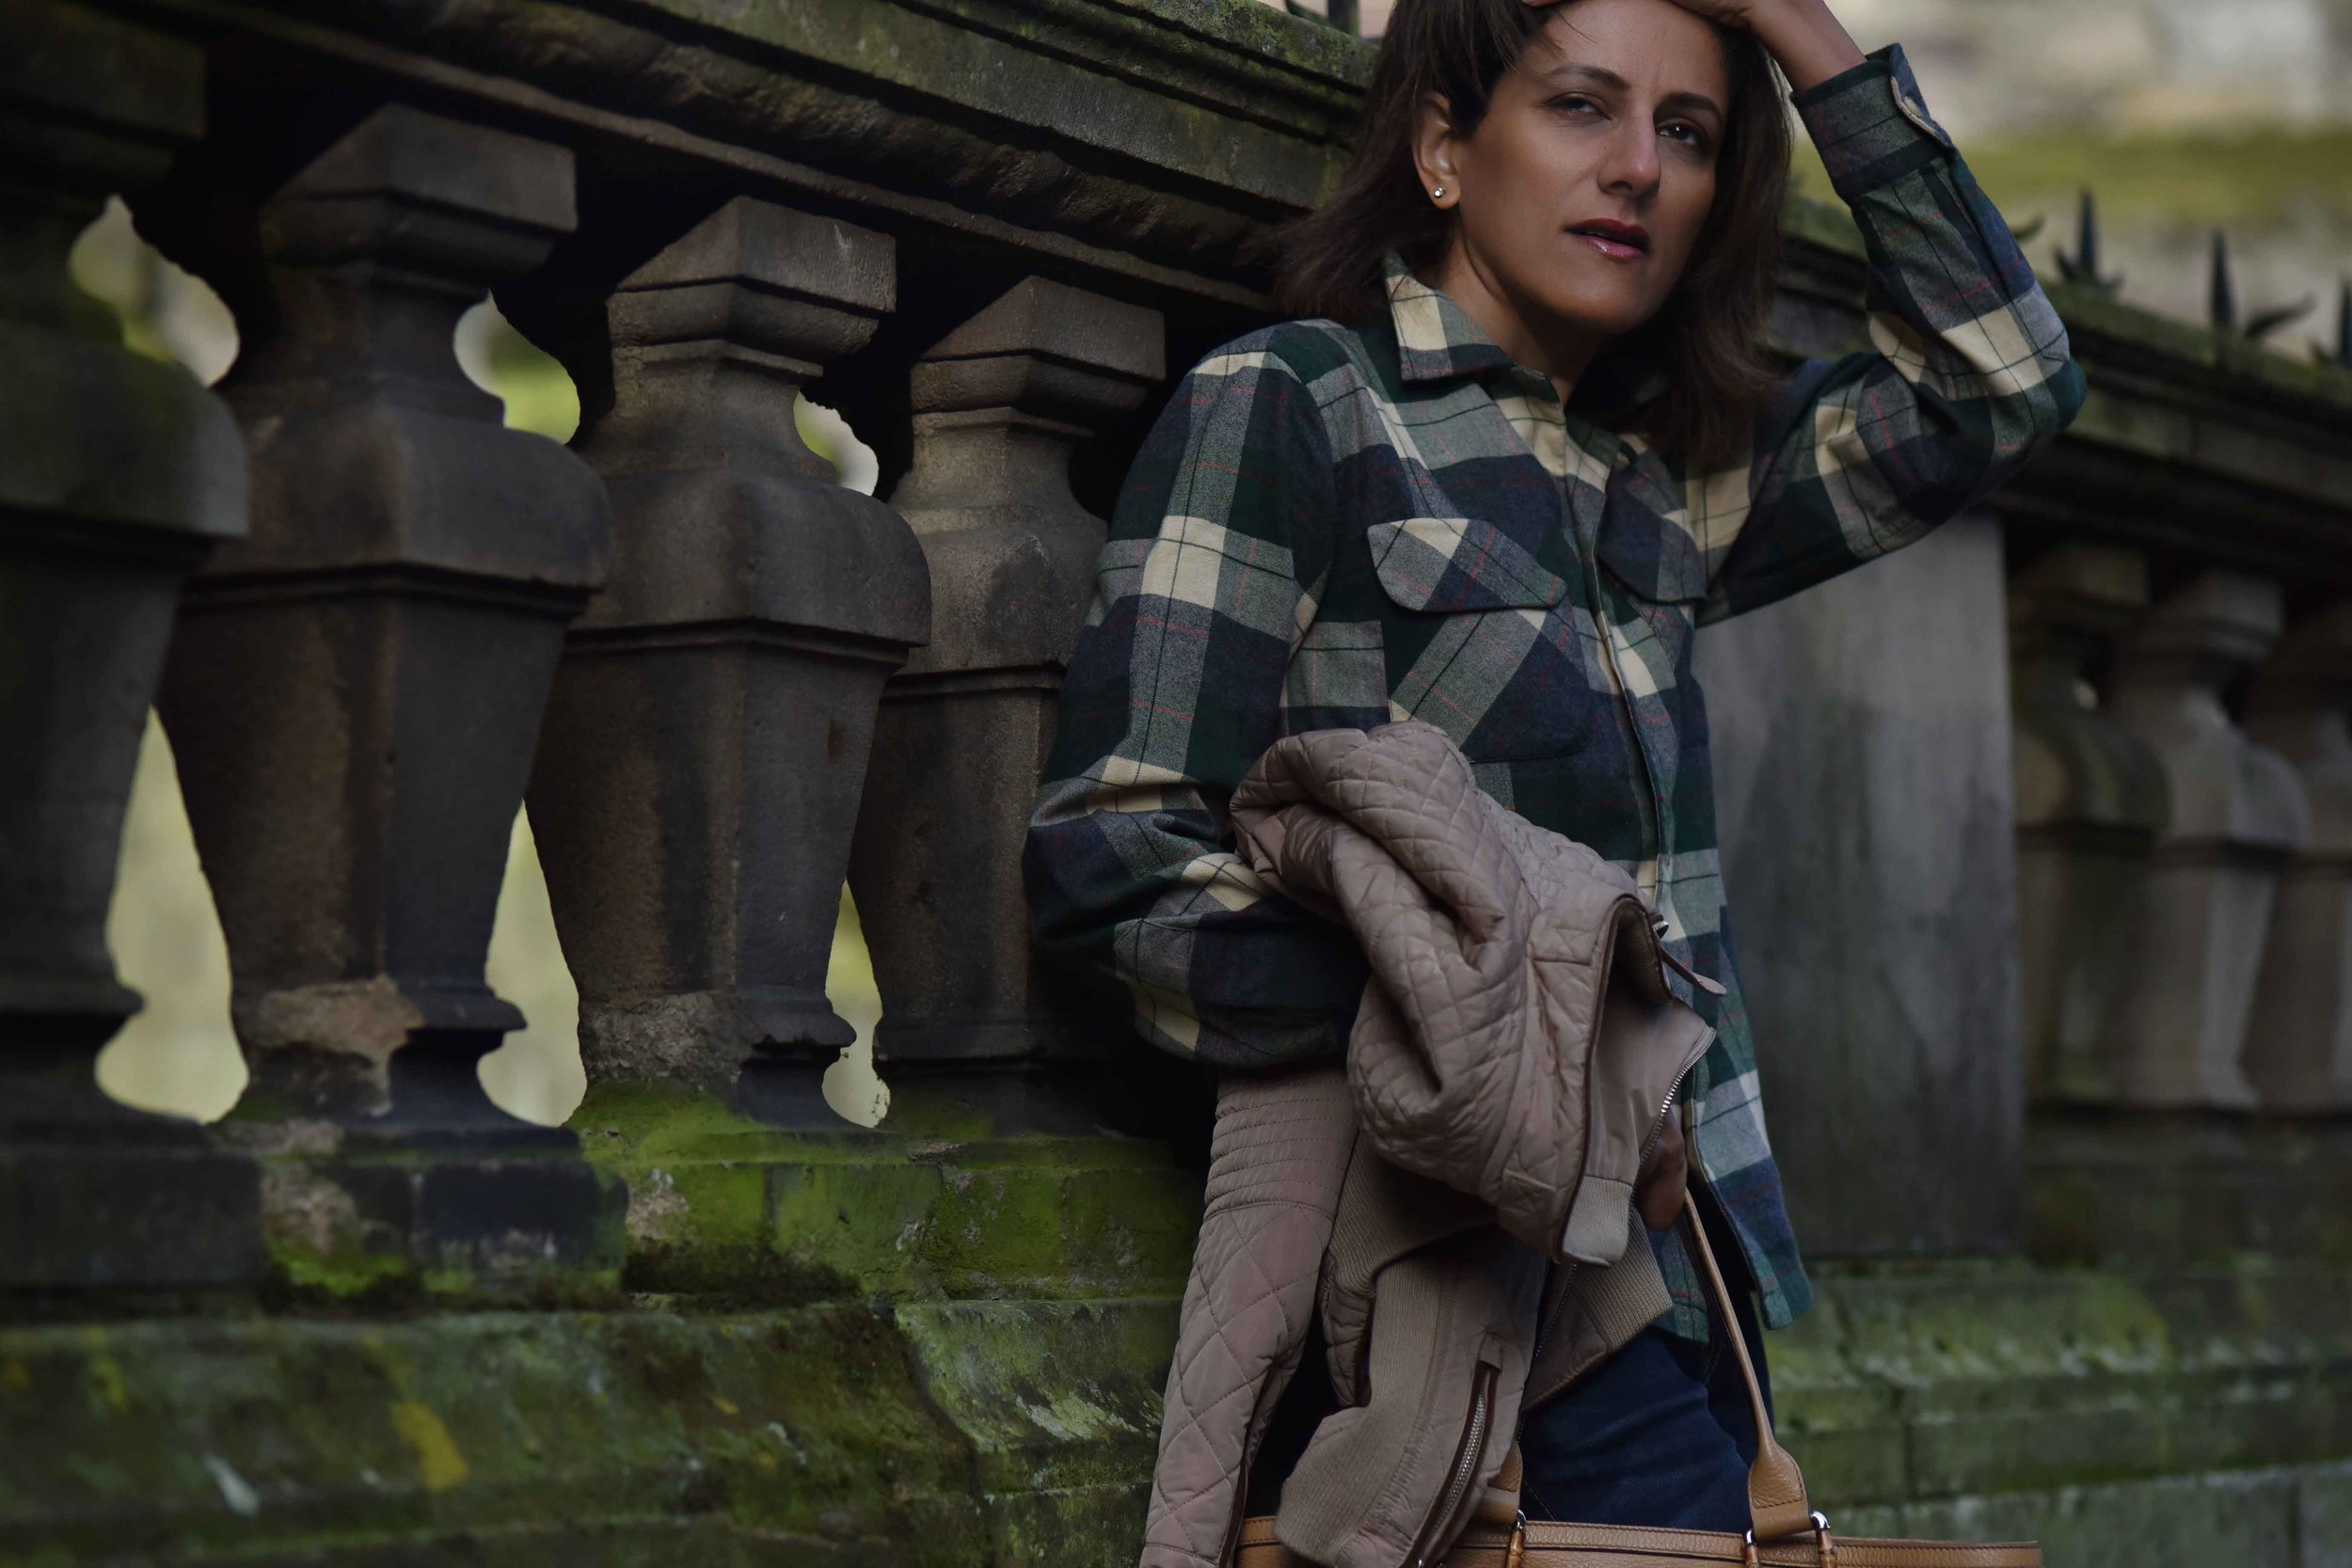 Ralph Lauren check shirt, Zara quilted jacket, True Religion jeans, Edinburgh, Scotland. Image©thingstodot.com